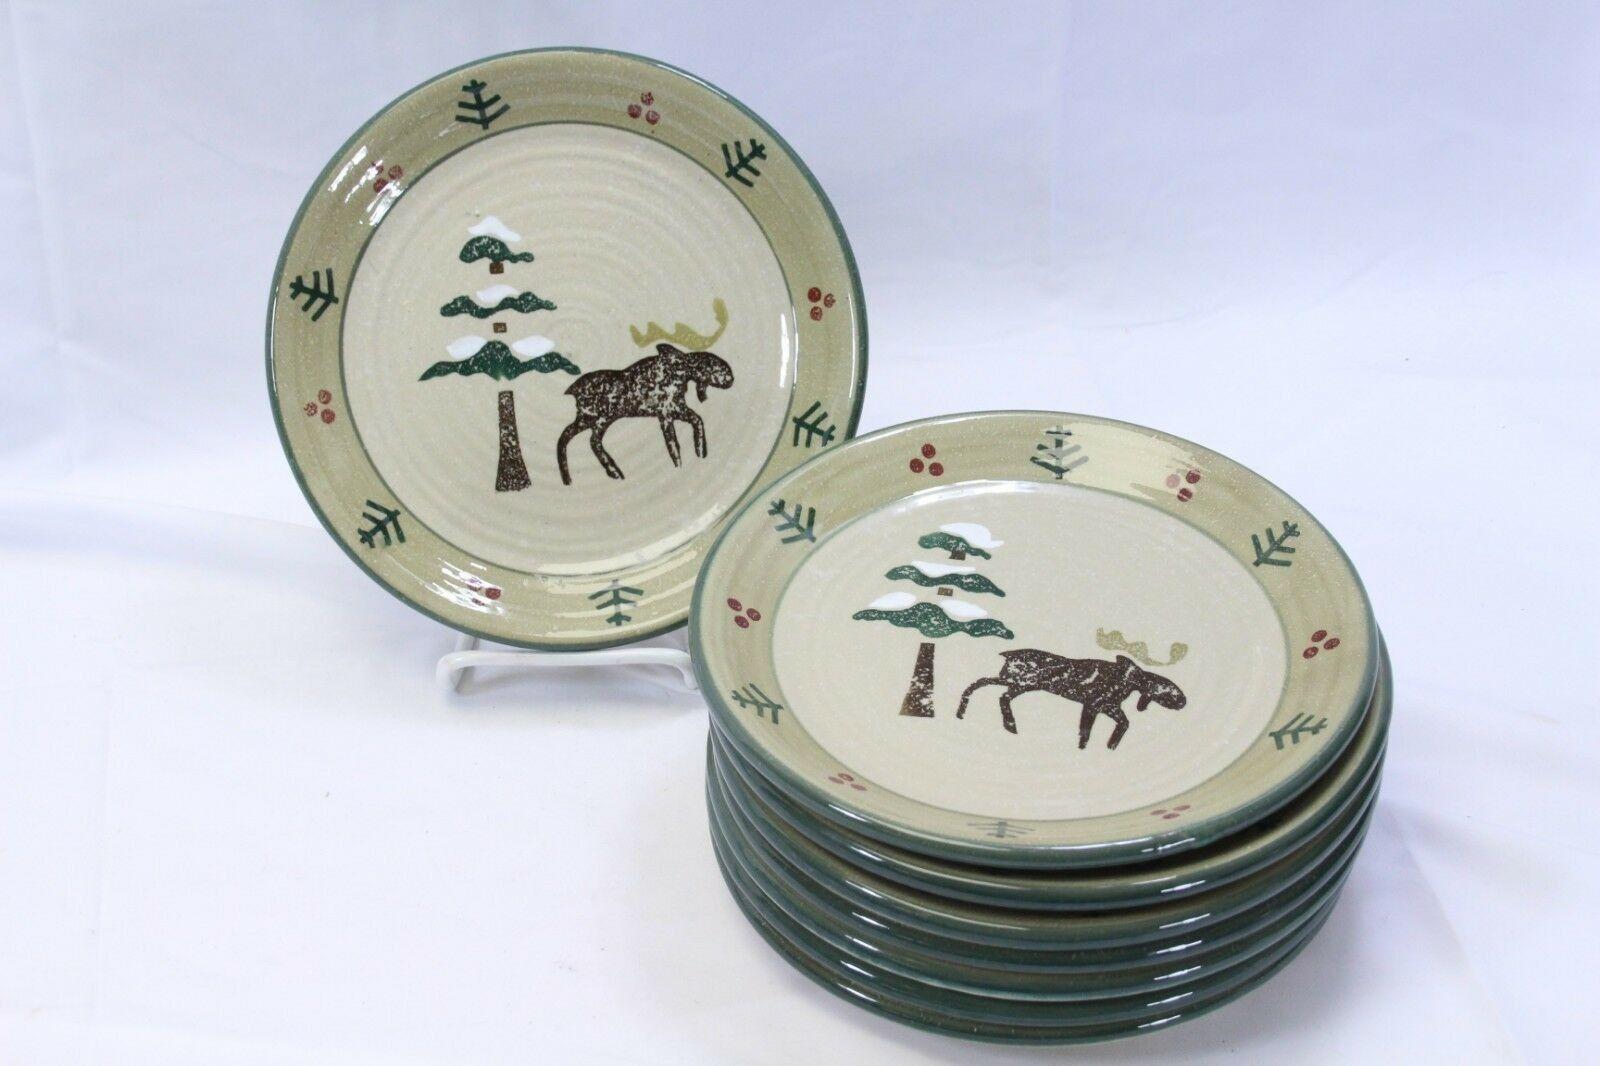 Sonoma Lodge Xmas Salad Plates Moose 7.875  Lot of 8